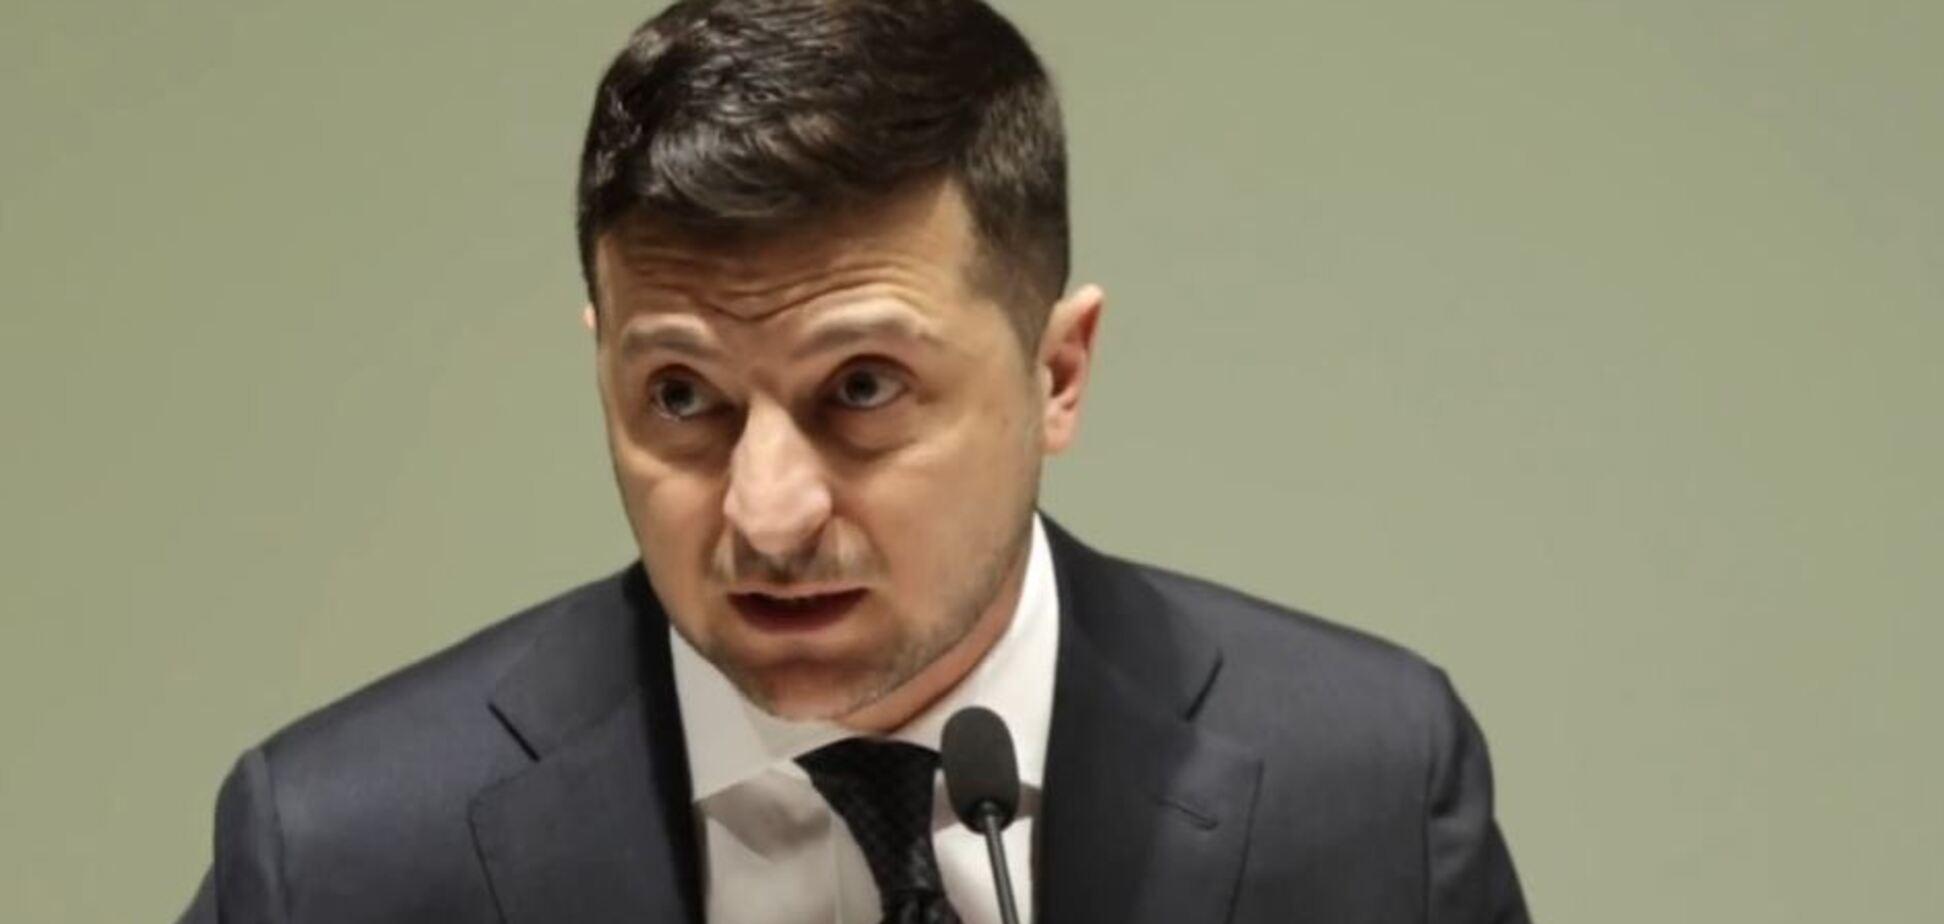 Зеленський екстрено скликав РНБО: кордони України можуть закрити